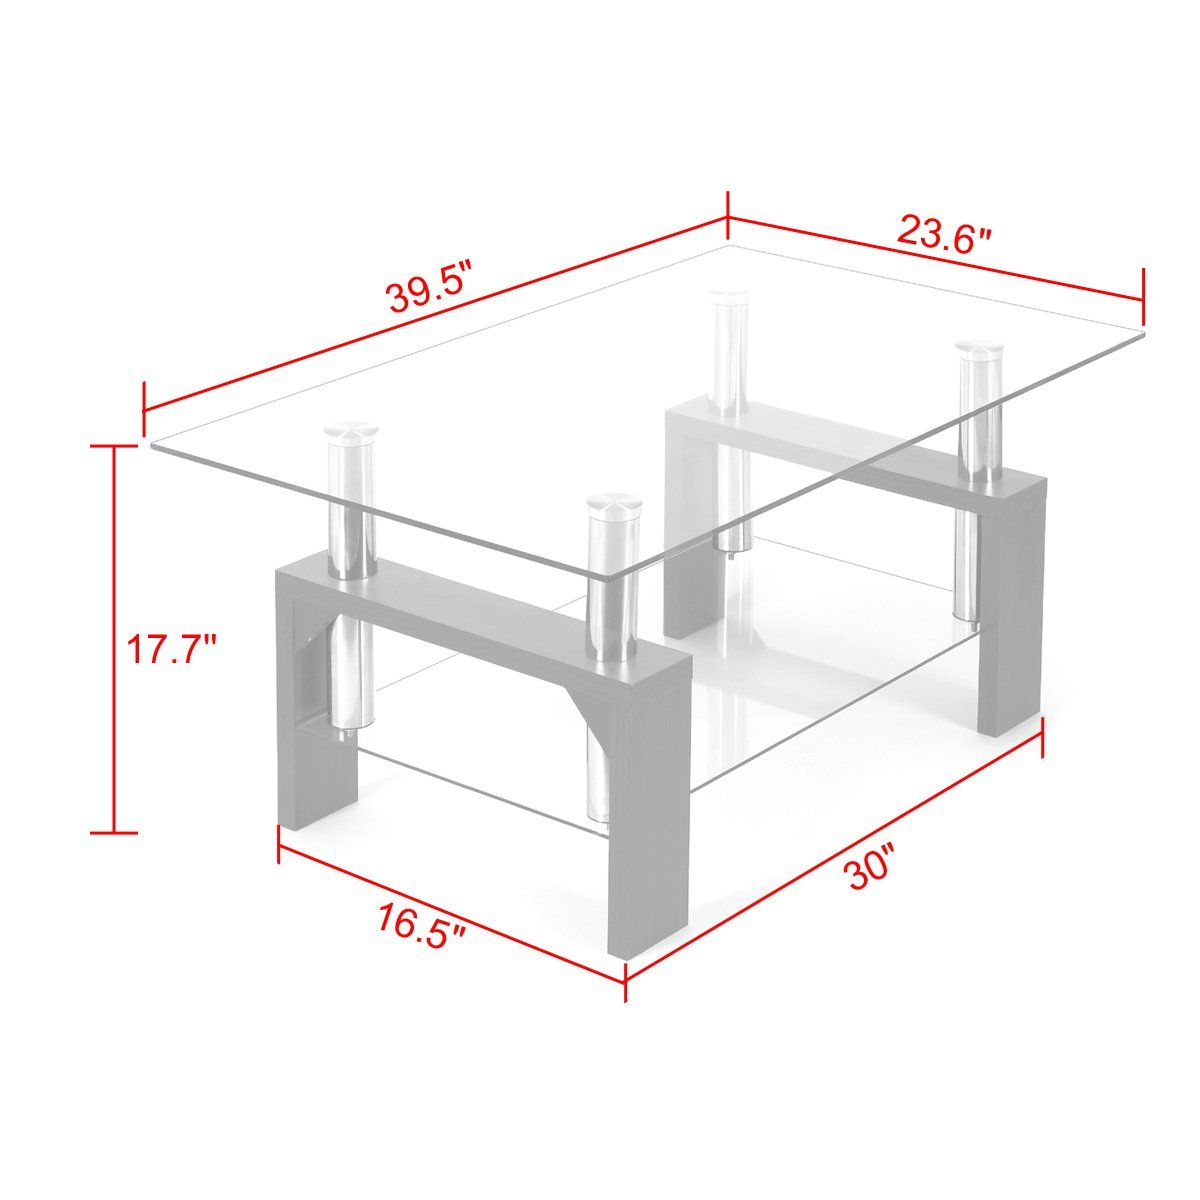 Jaxpety Rectangular Glass Coffee Table Shelf Wood Living Room Furniture Chrome Base Wood Furniture Living Room Living Room Wood Rectangular Glass Coffee Table [ 1200 x 1200 Pixel ]